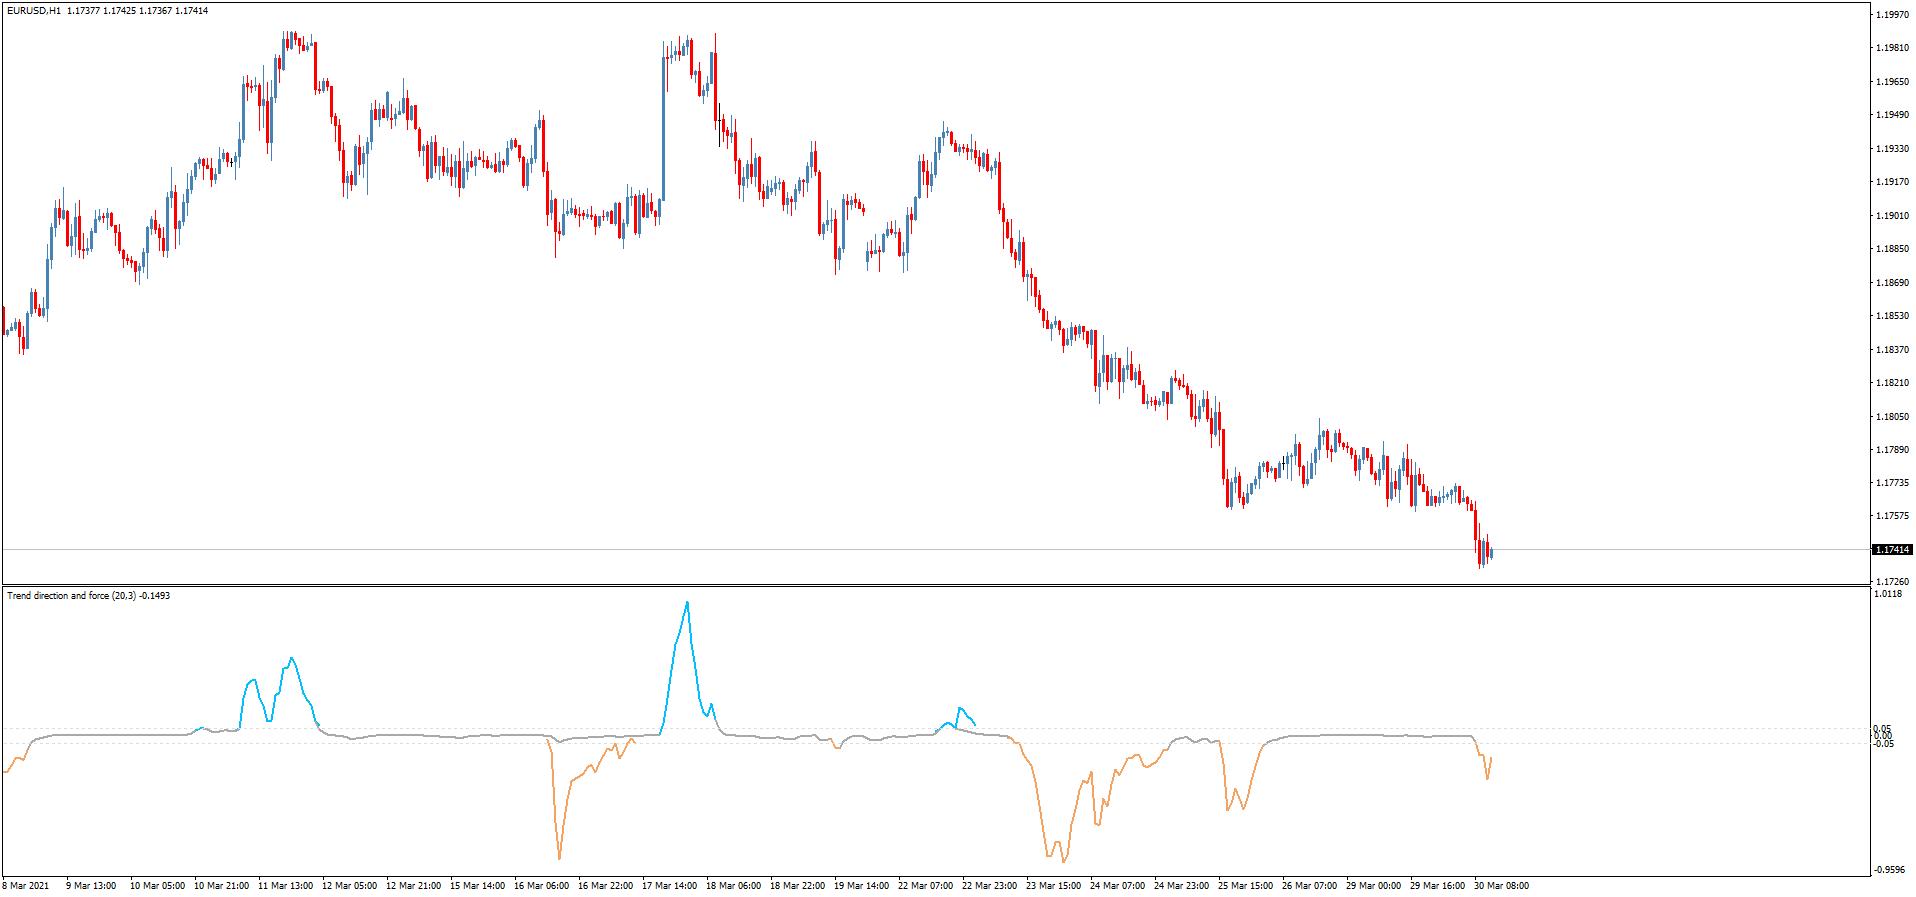 Трендовый индикатор Trend direction and force